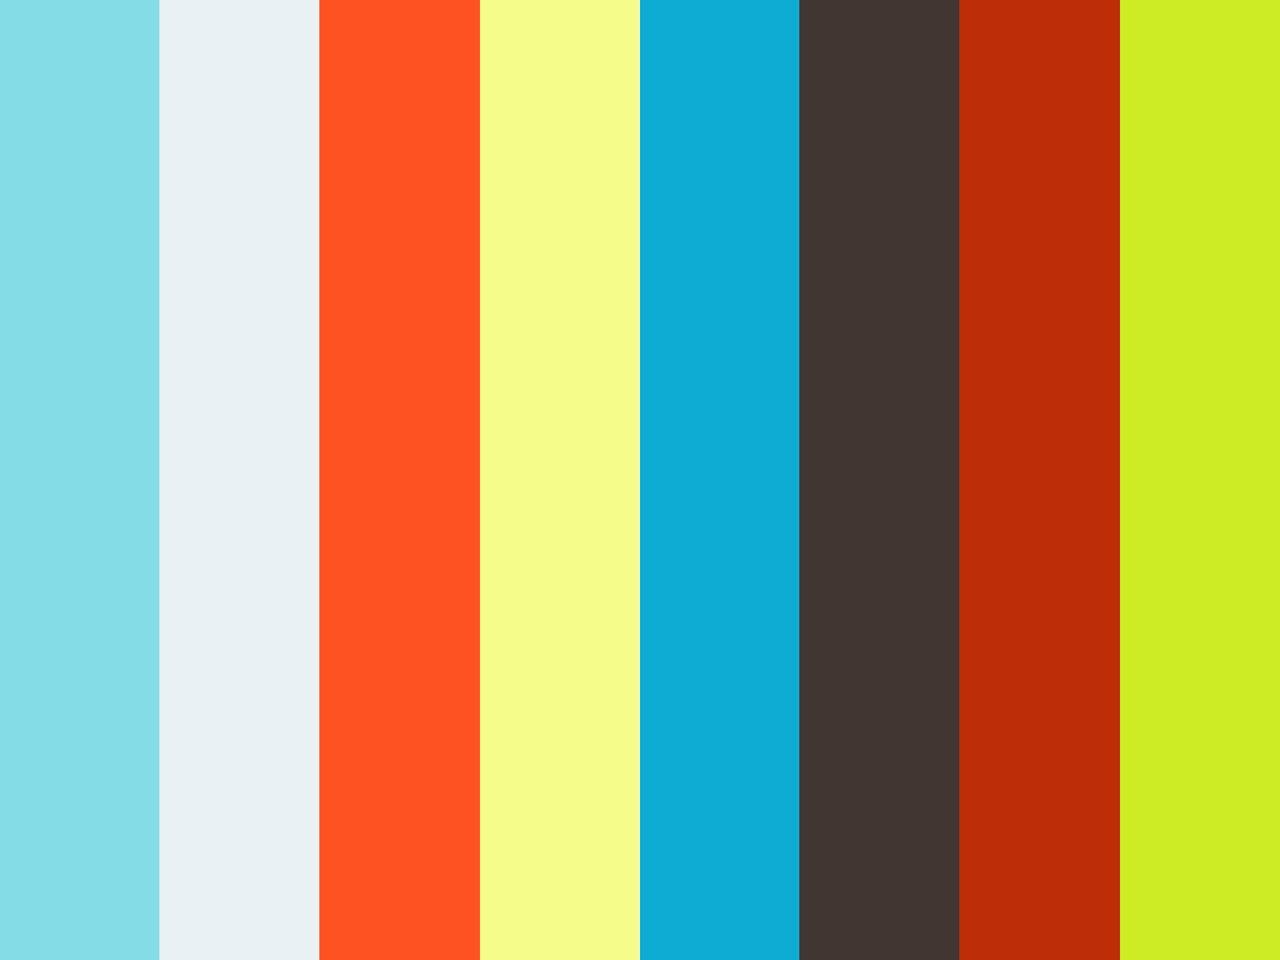 CHROMA GALAXIES // HDR // Rec. 2100 // BT. 2084